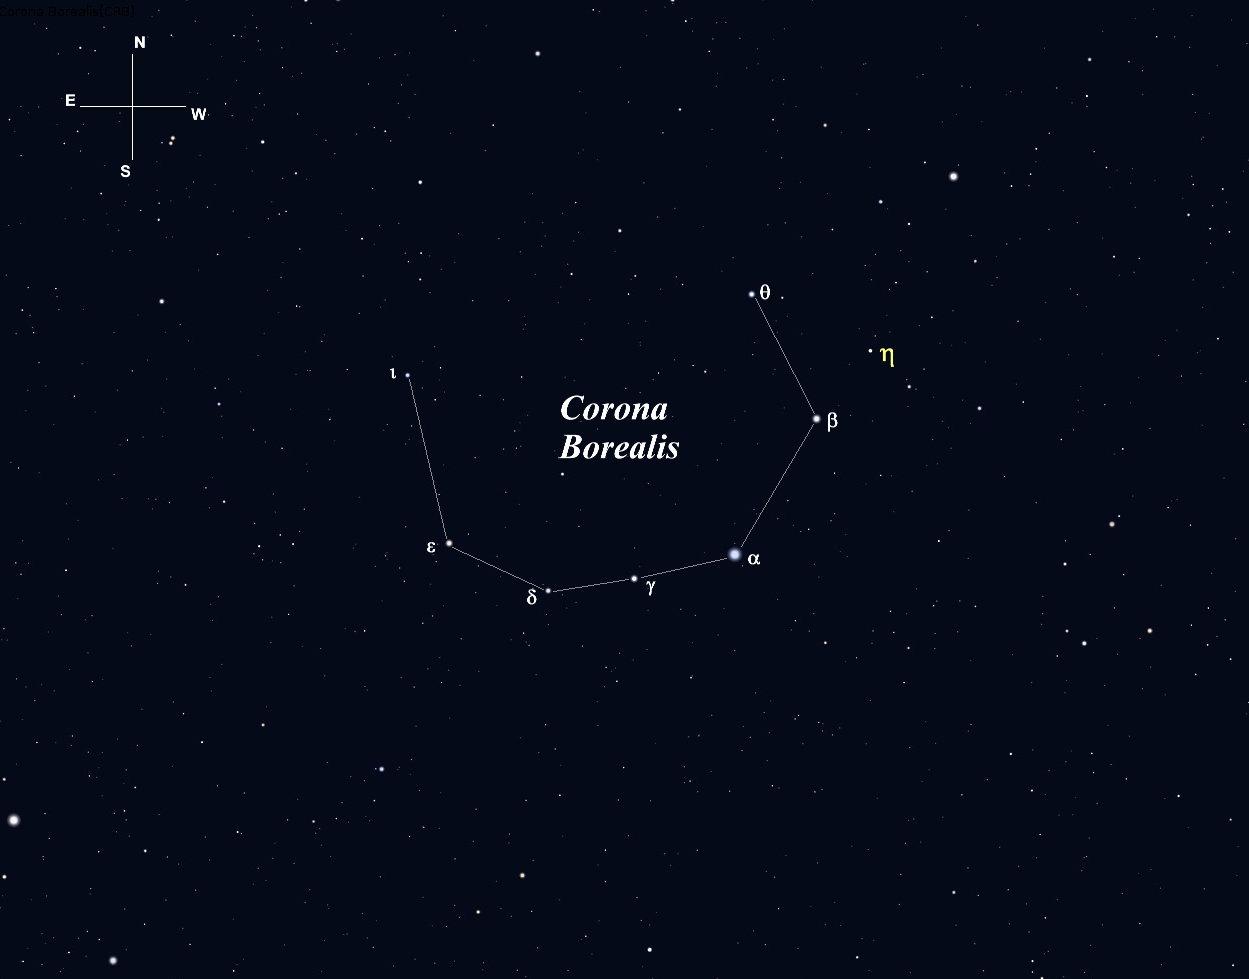 Corona Borealis | Star-Splitters